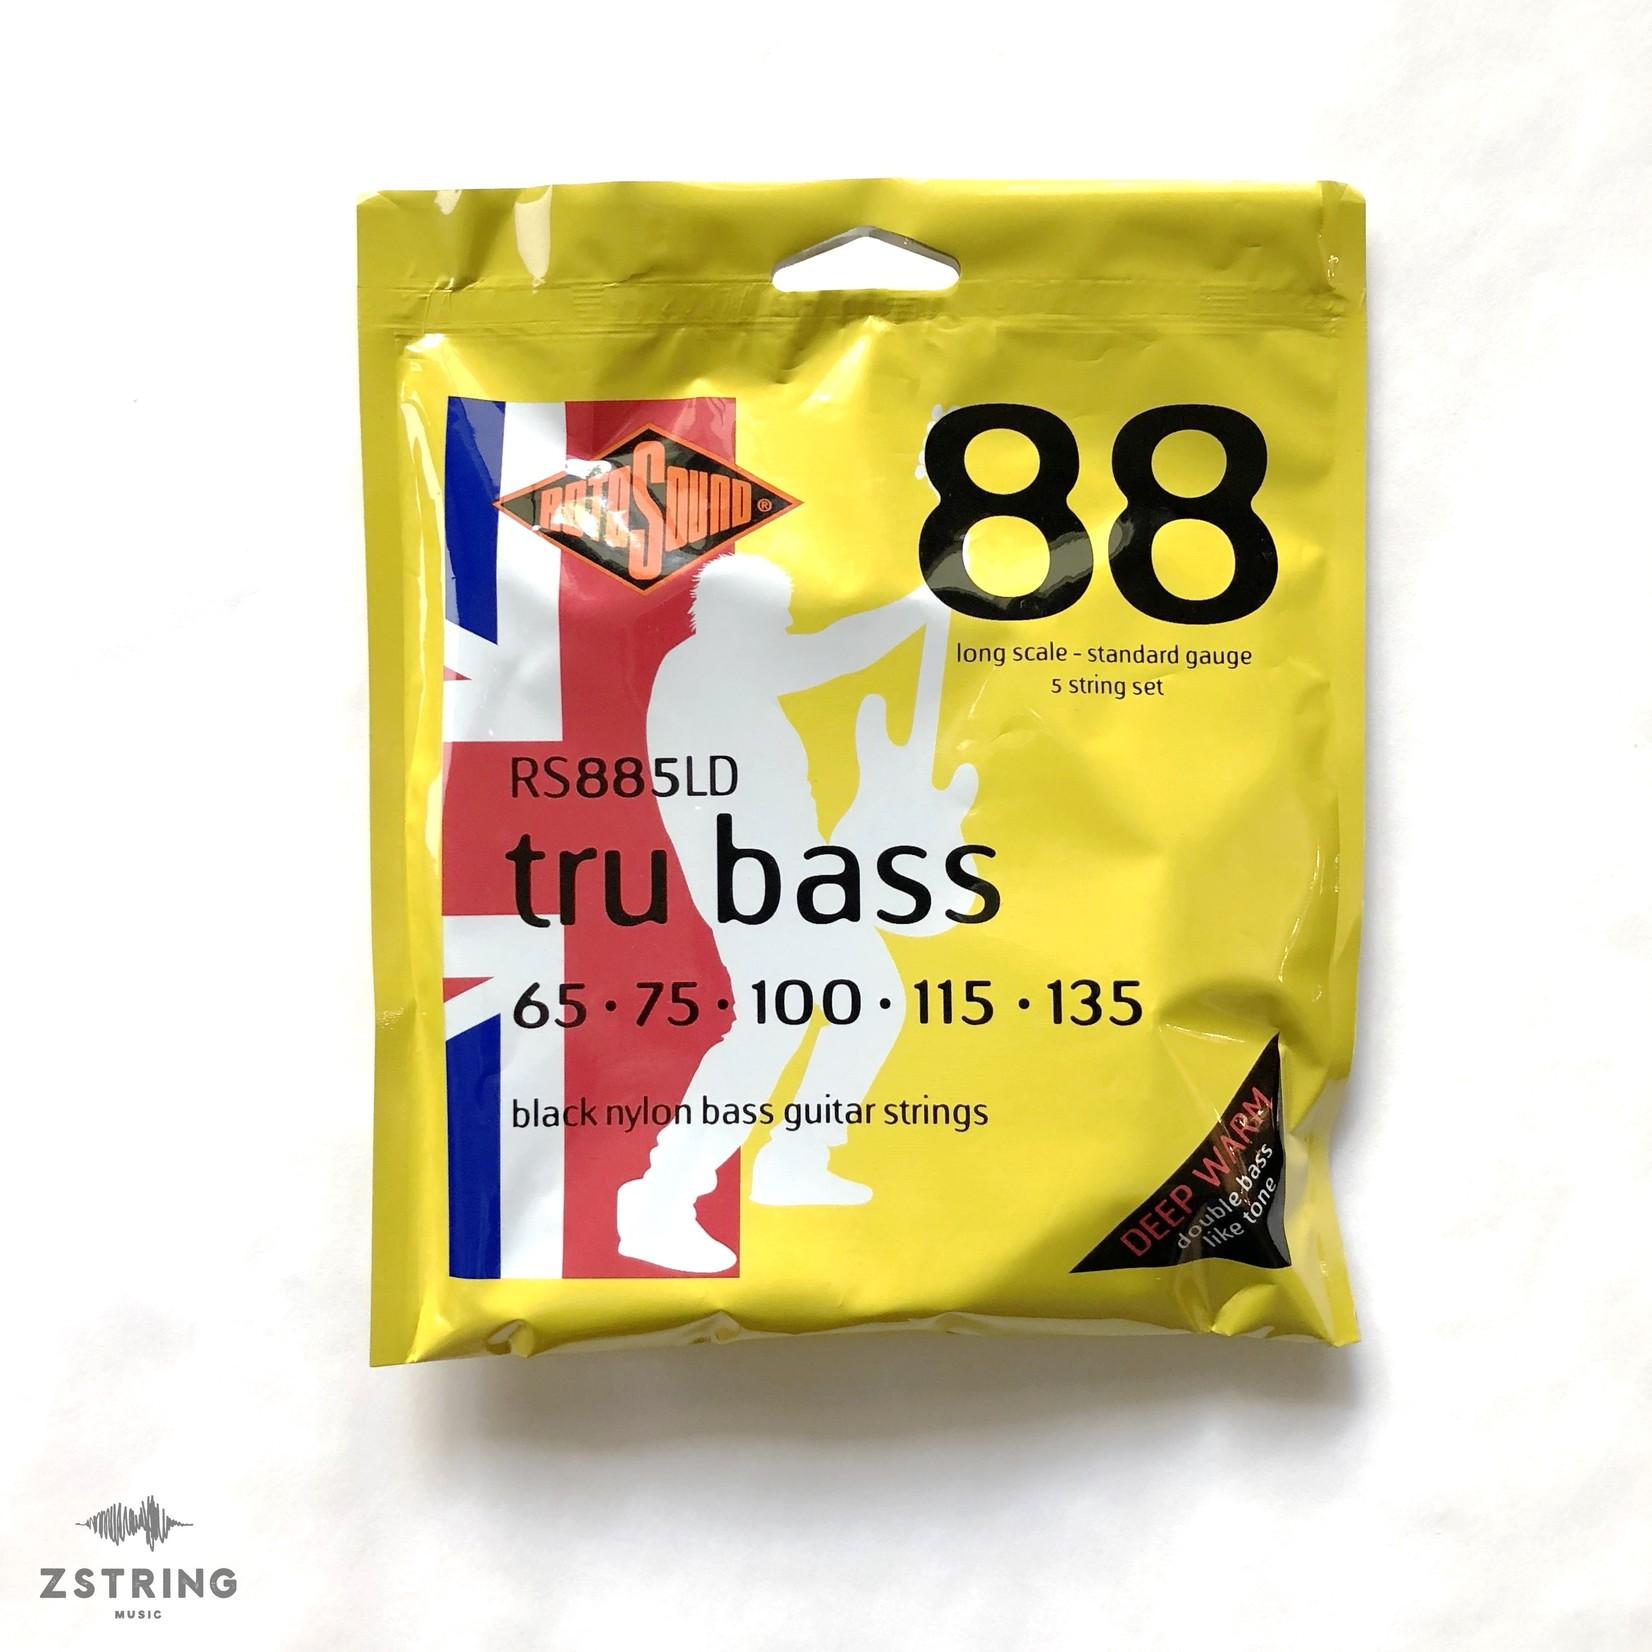 Rotosound Rotosound RS885LD (5-String Set) tru bass Black Nylon Bass Strings, Long Scale, Standard Gauge